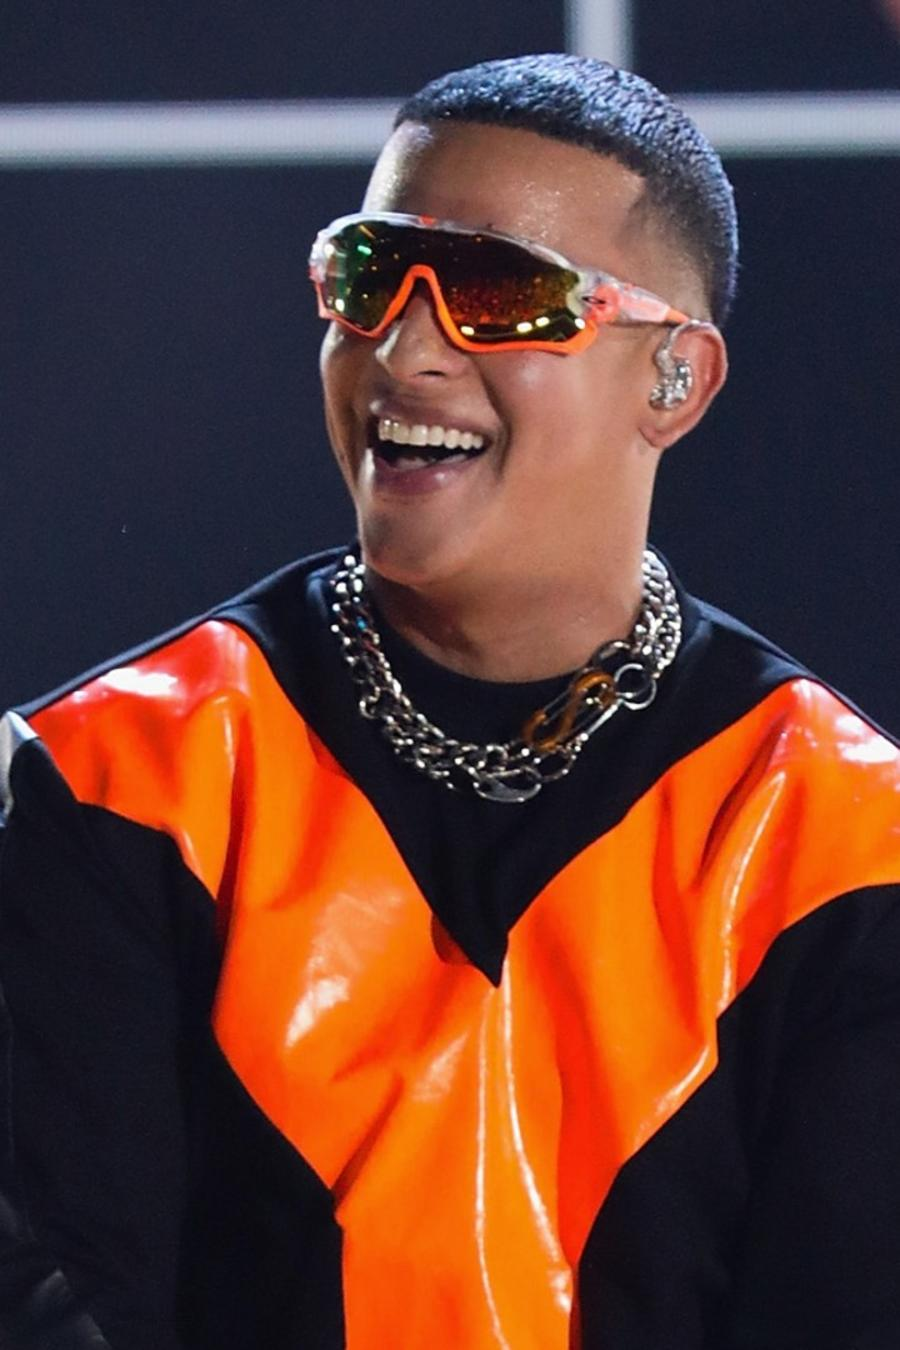 Daddy Yankee en los Kids Choice Awards Mexico 2019